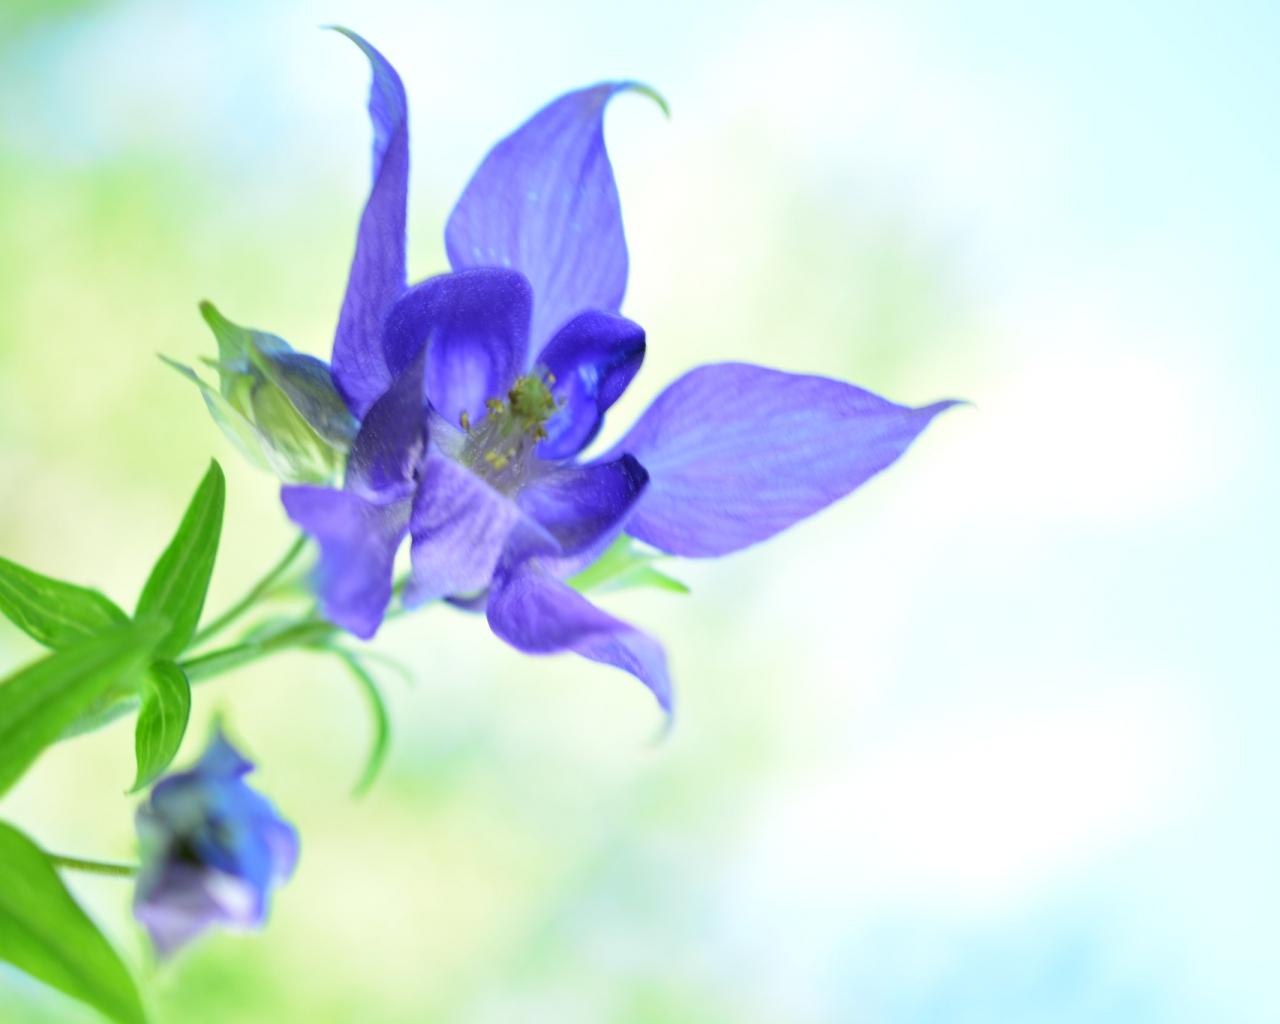 Bella flor azul - 1280x1024